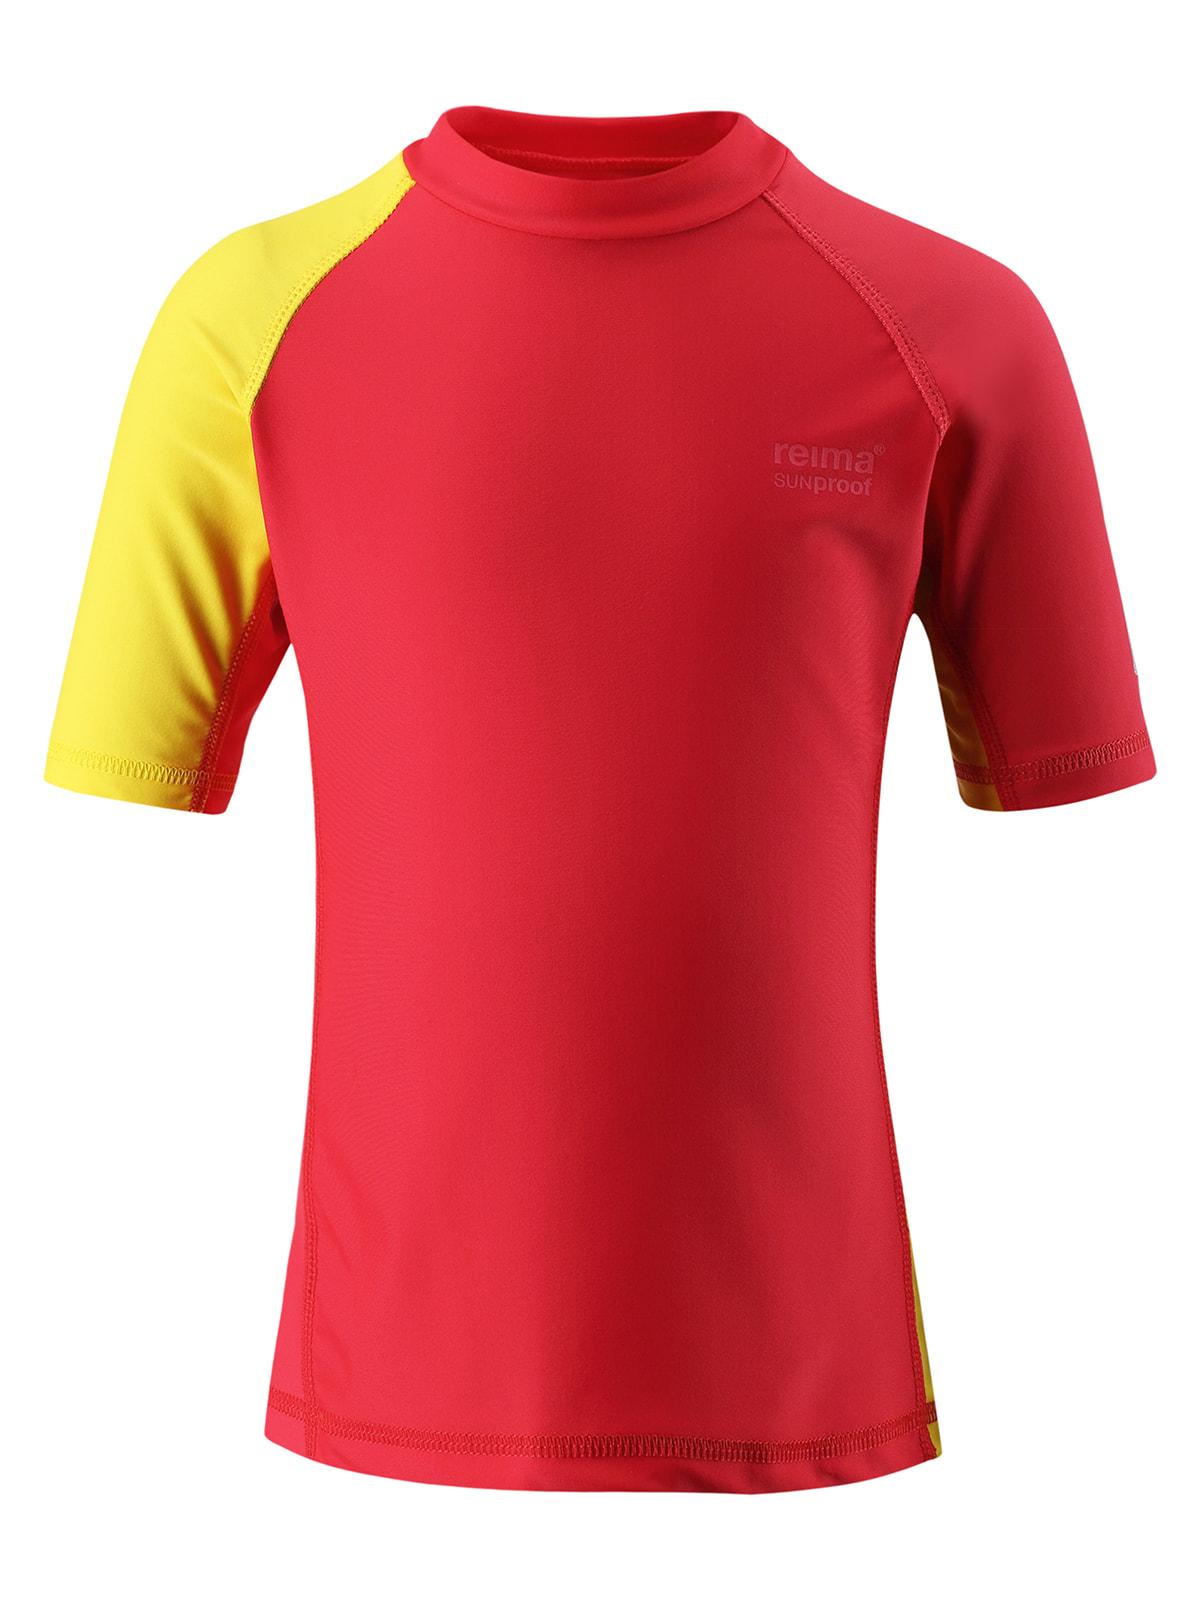 Футболка червоно-жовта | 942864